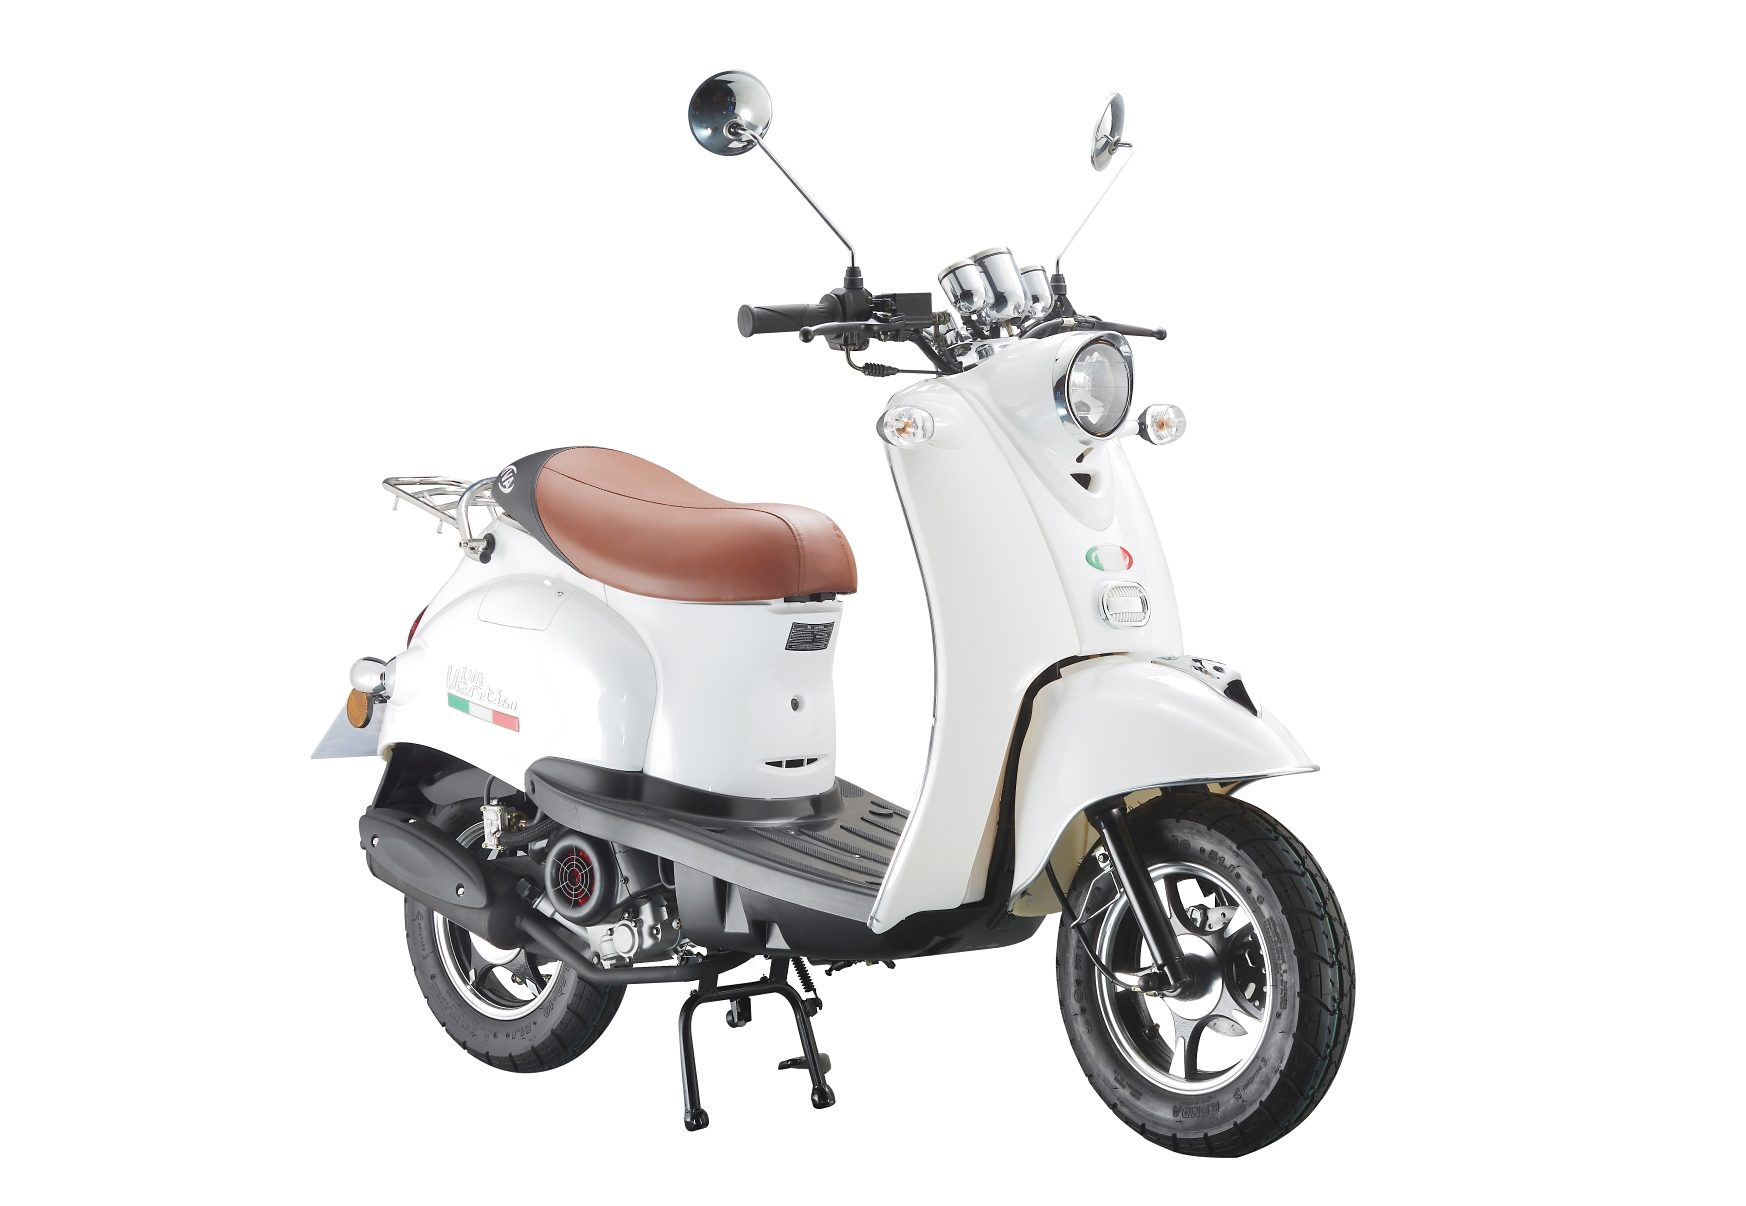 Mofaroller »VENTI 50«, 50 ccm 25 km/h, für 1 Person, weiß/braun